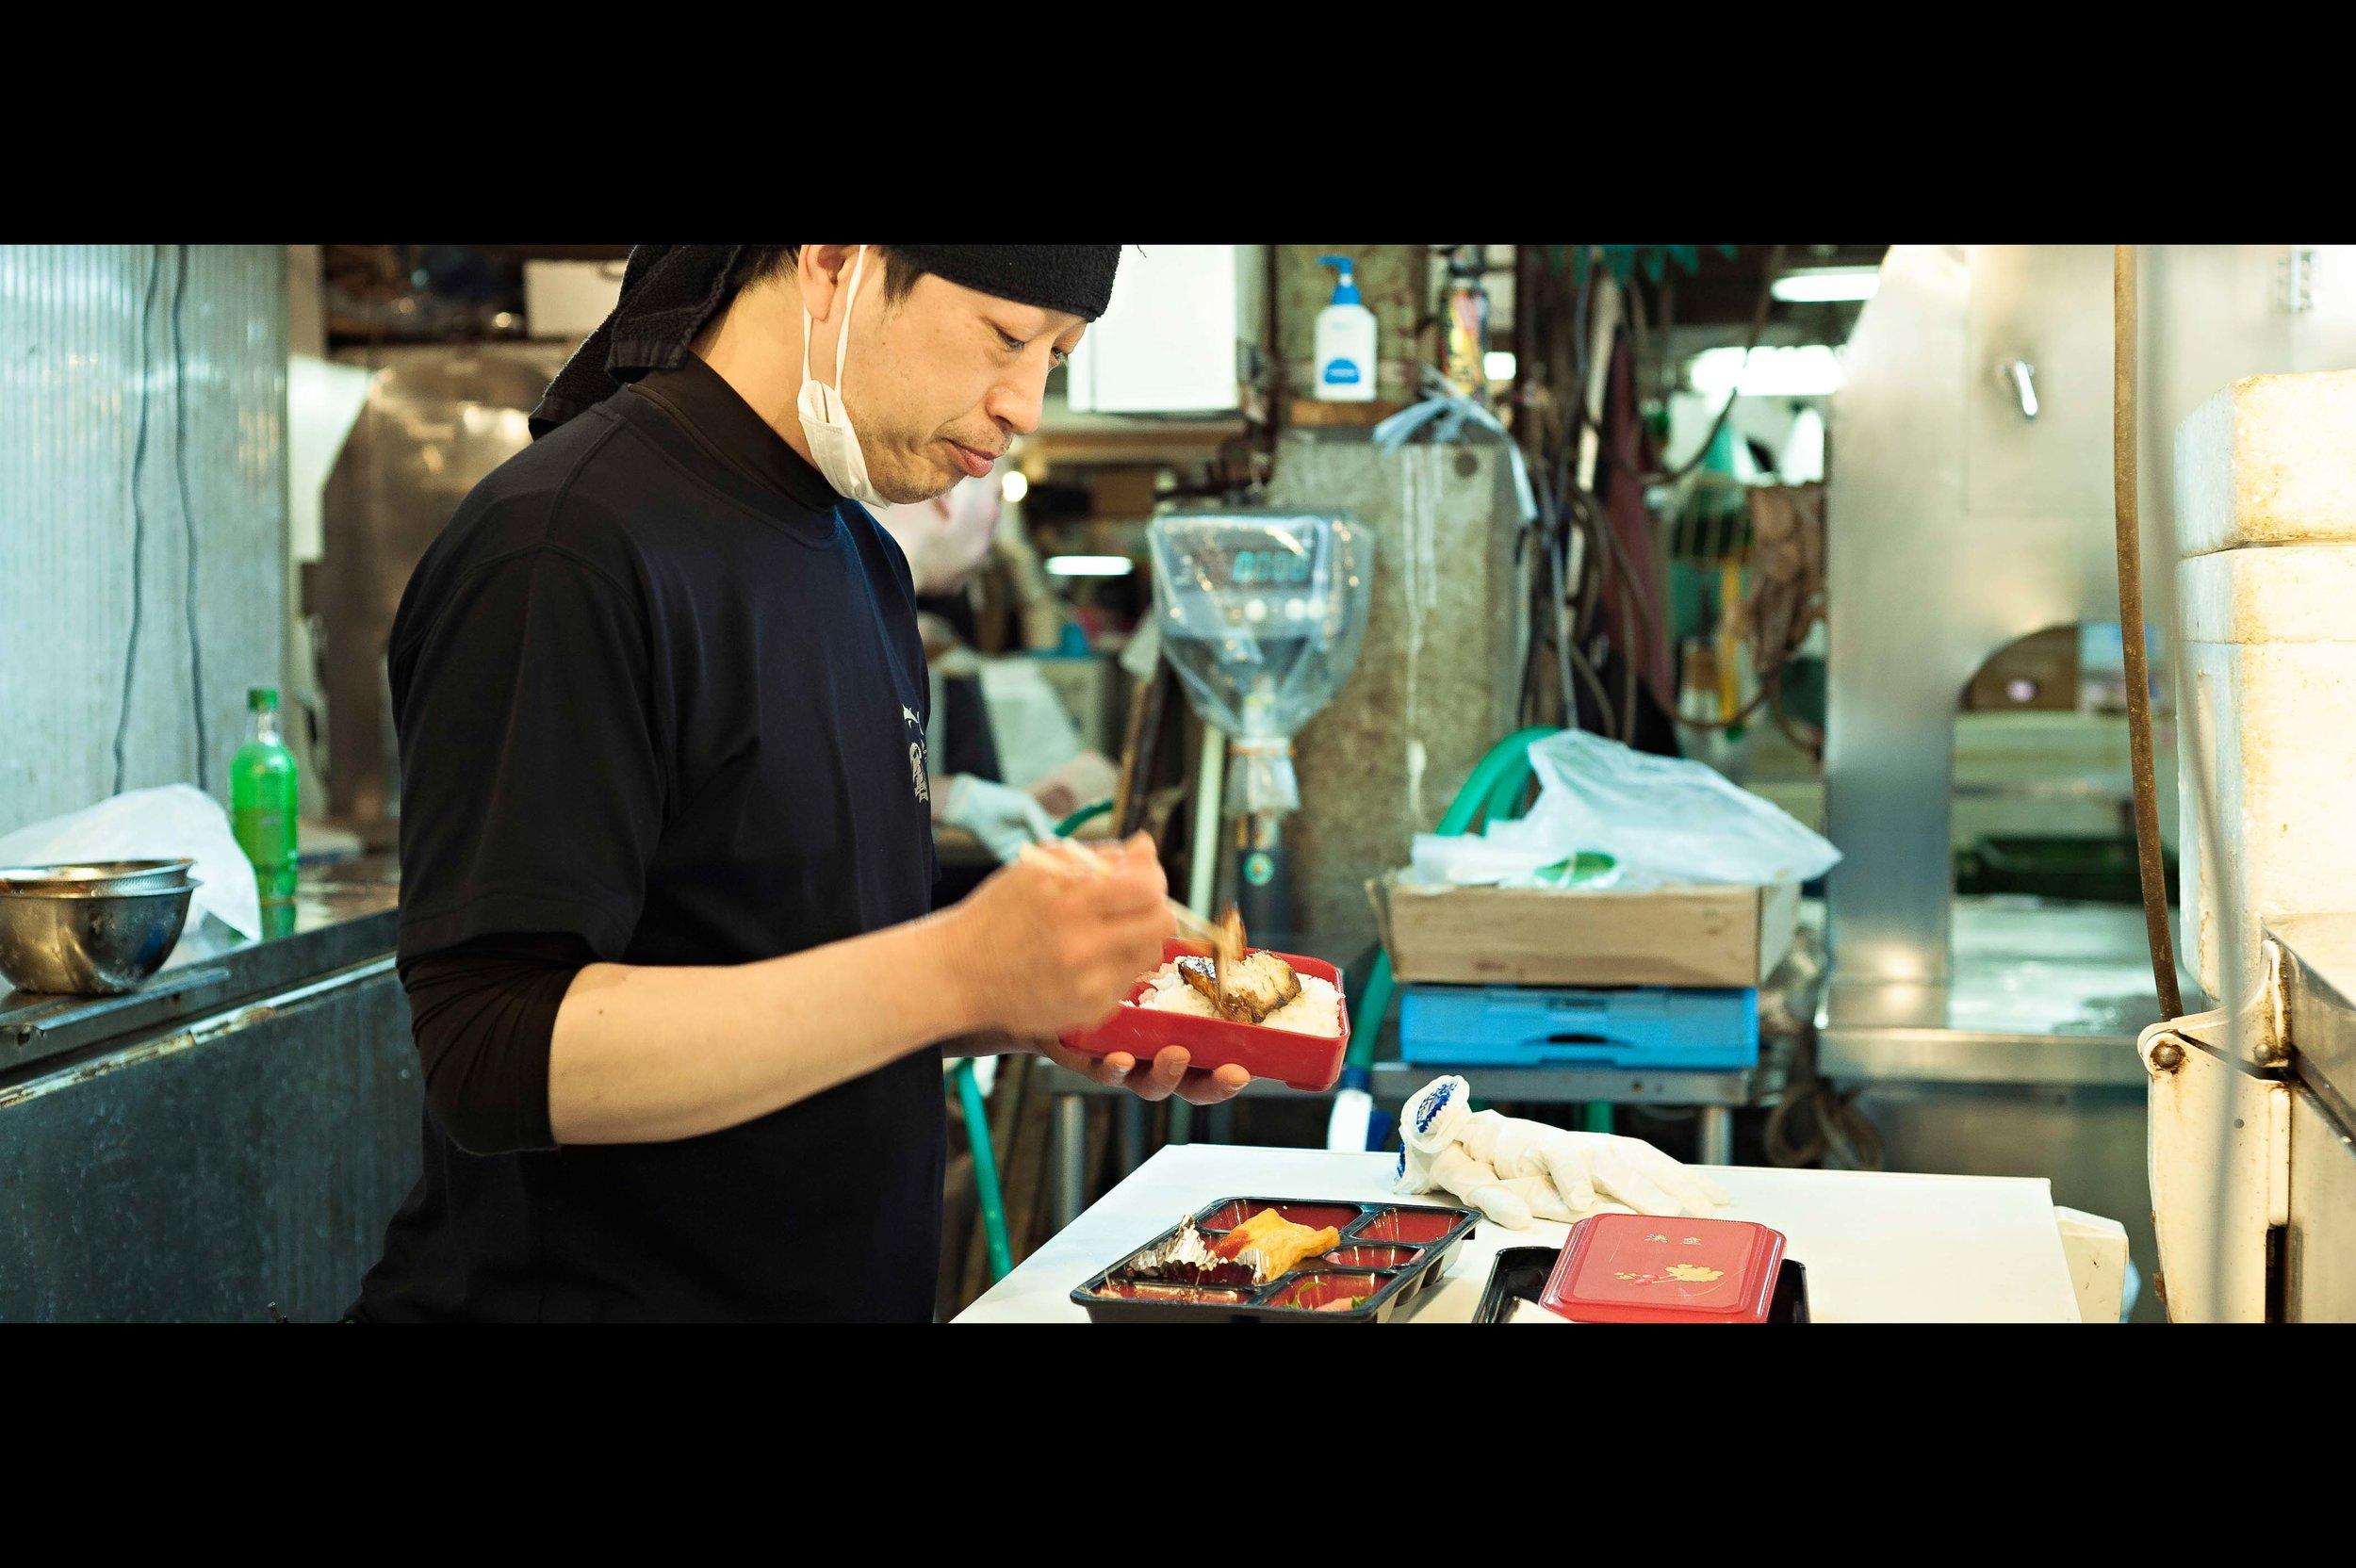 fish-vendor-eating-bento-box.jpg